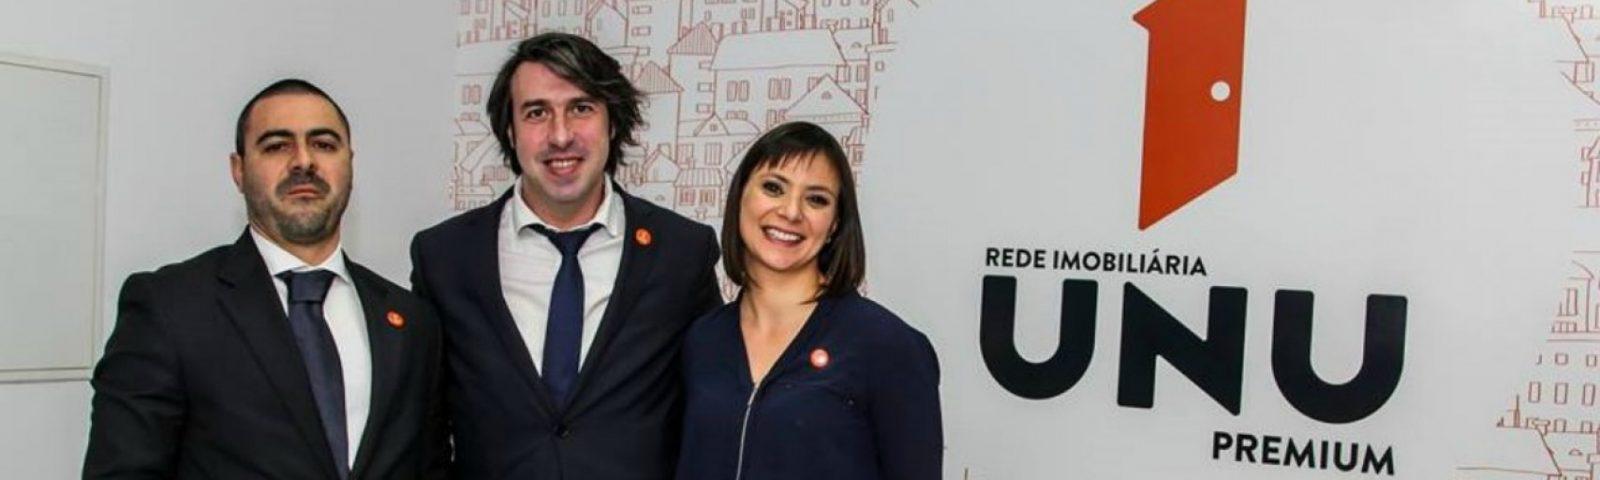 Grupo BizLeiria abre unidade UNU